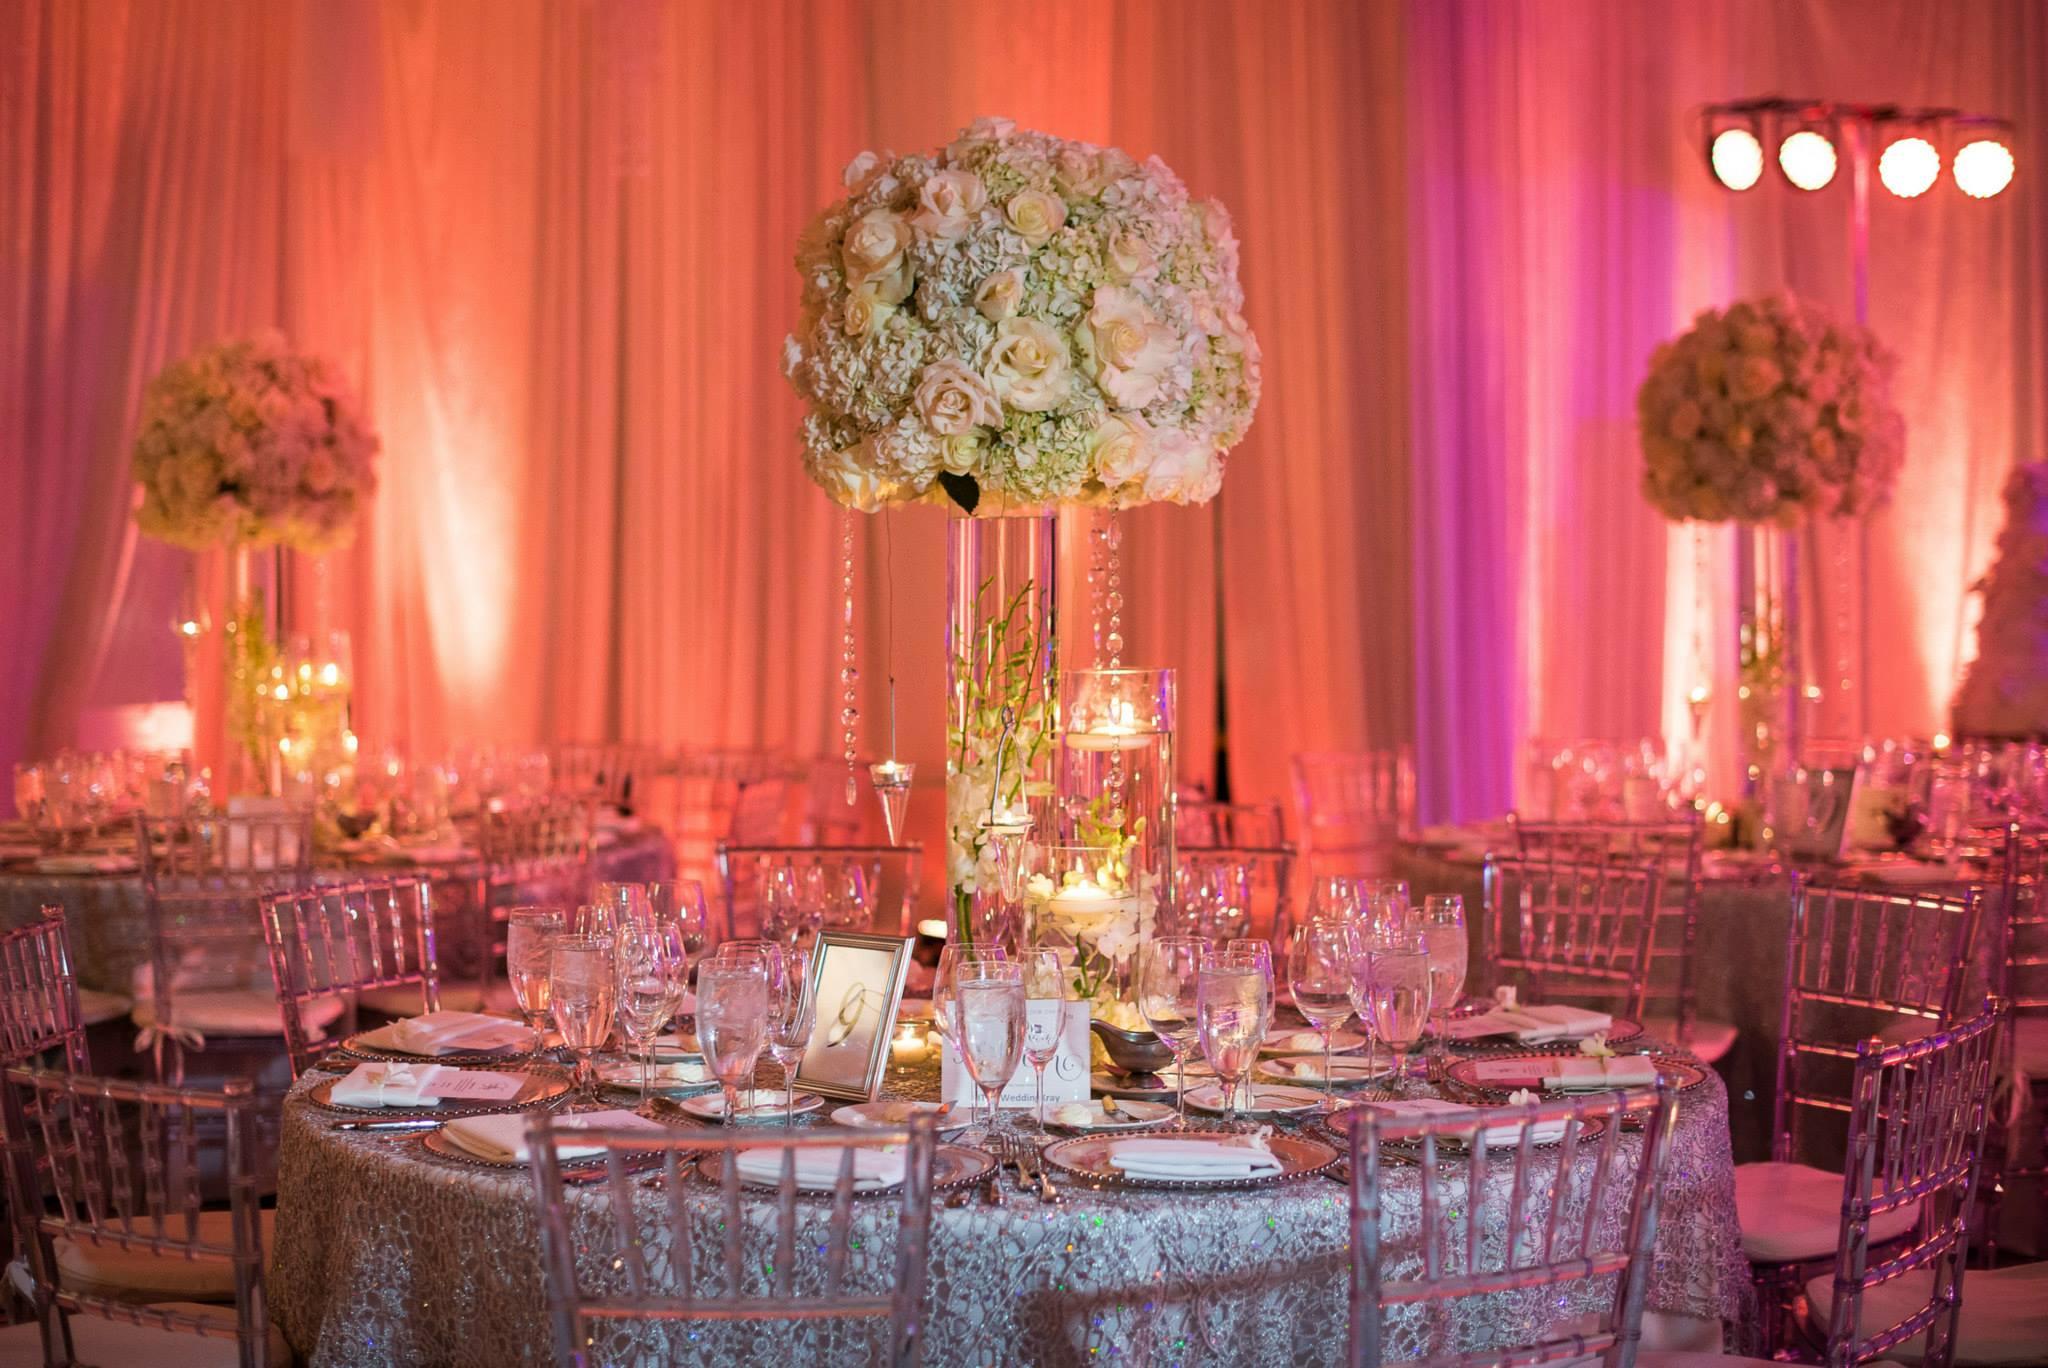 the-boca-raton-polo-club-wedding-reception-amber-uplighting-winter-wedding-artist-ben-keys-boca-raton-luxe-florals